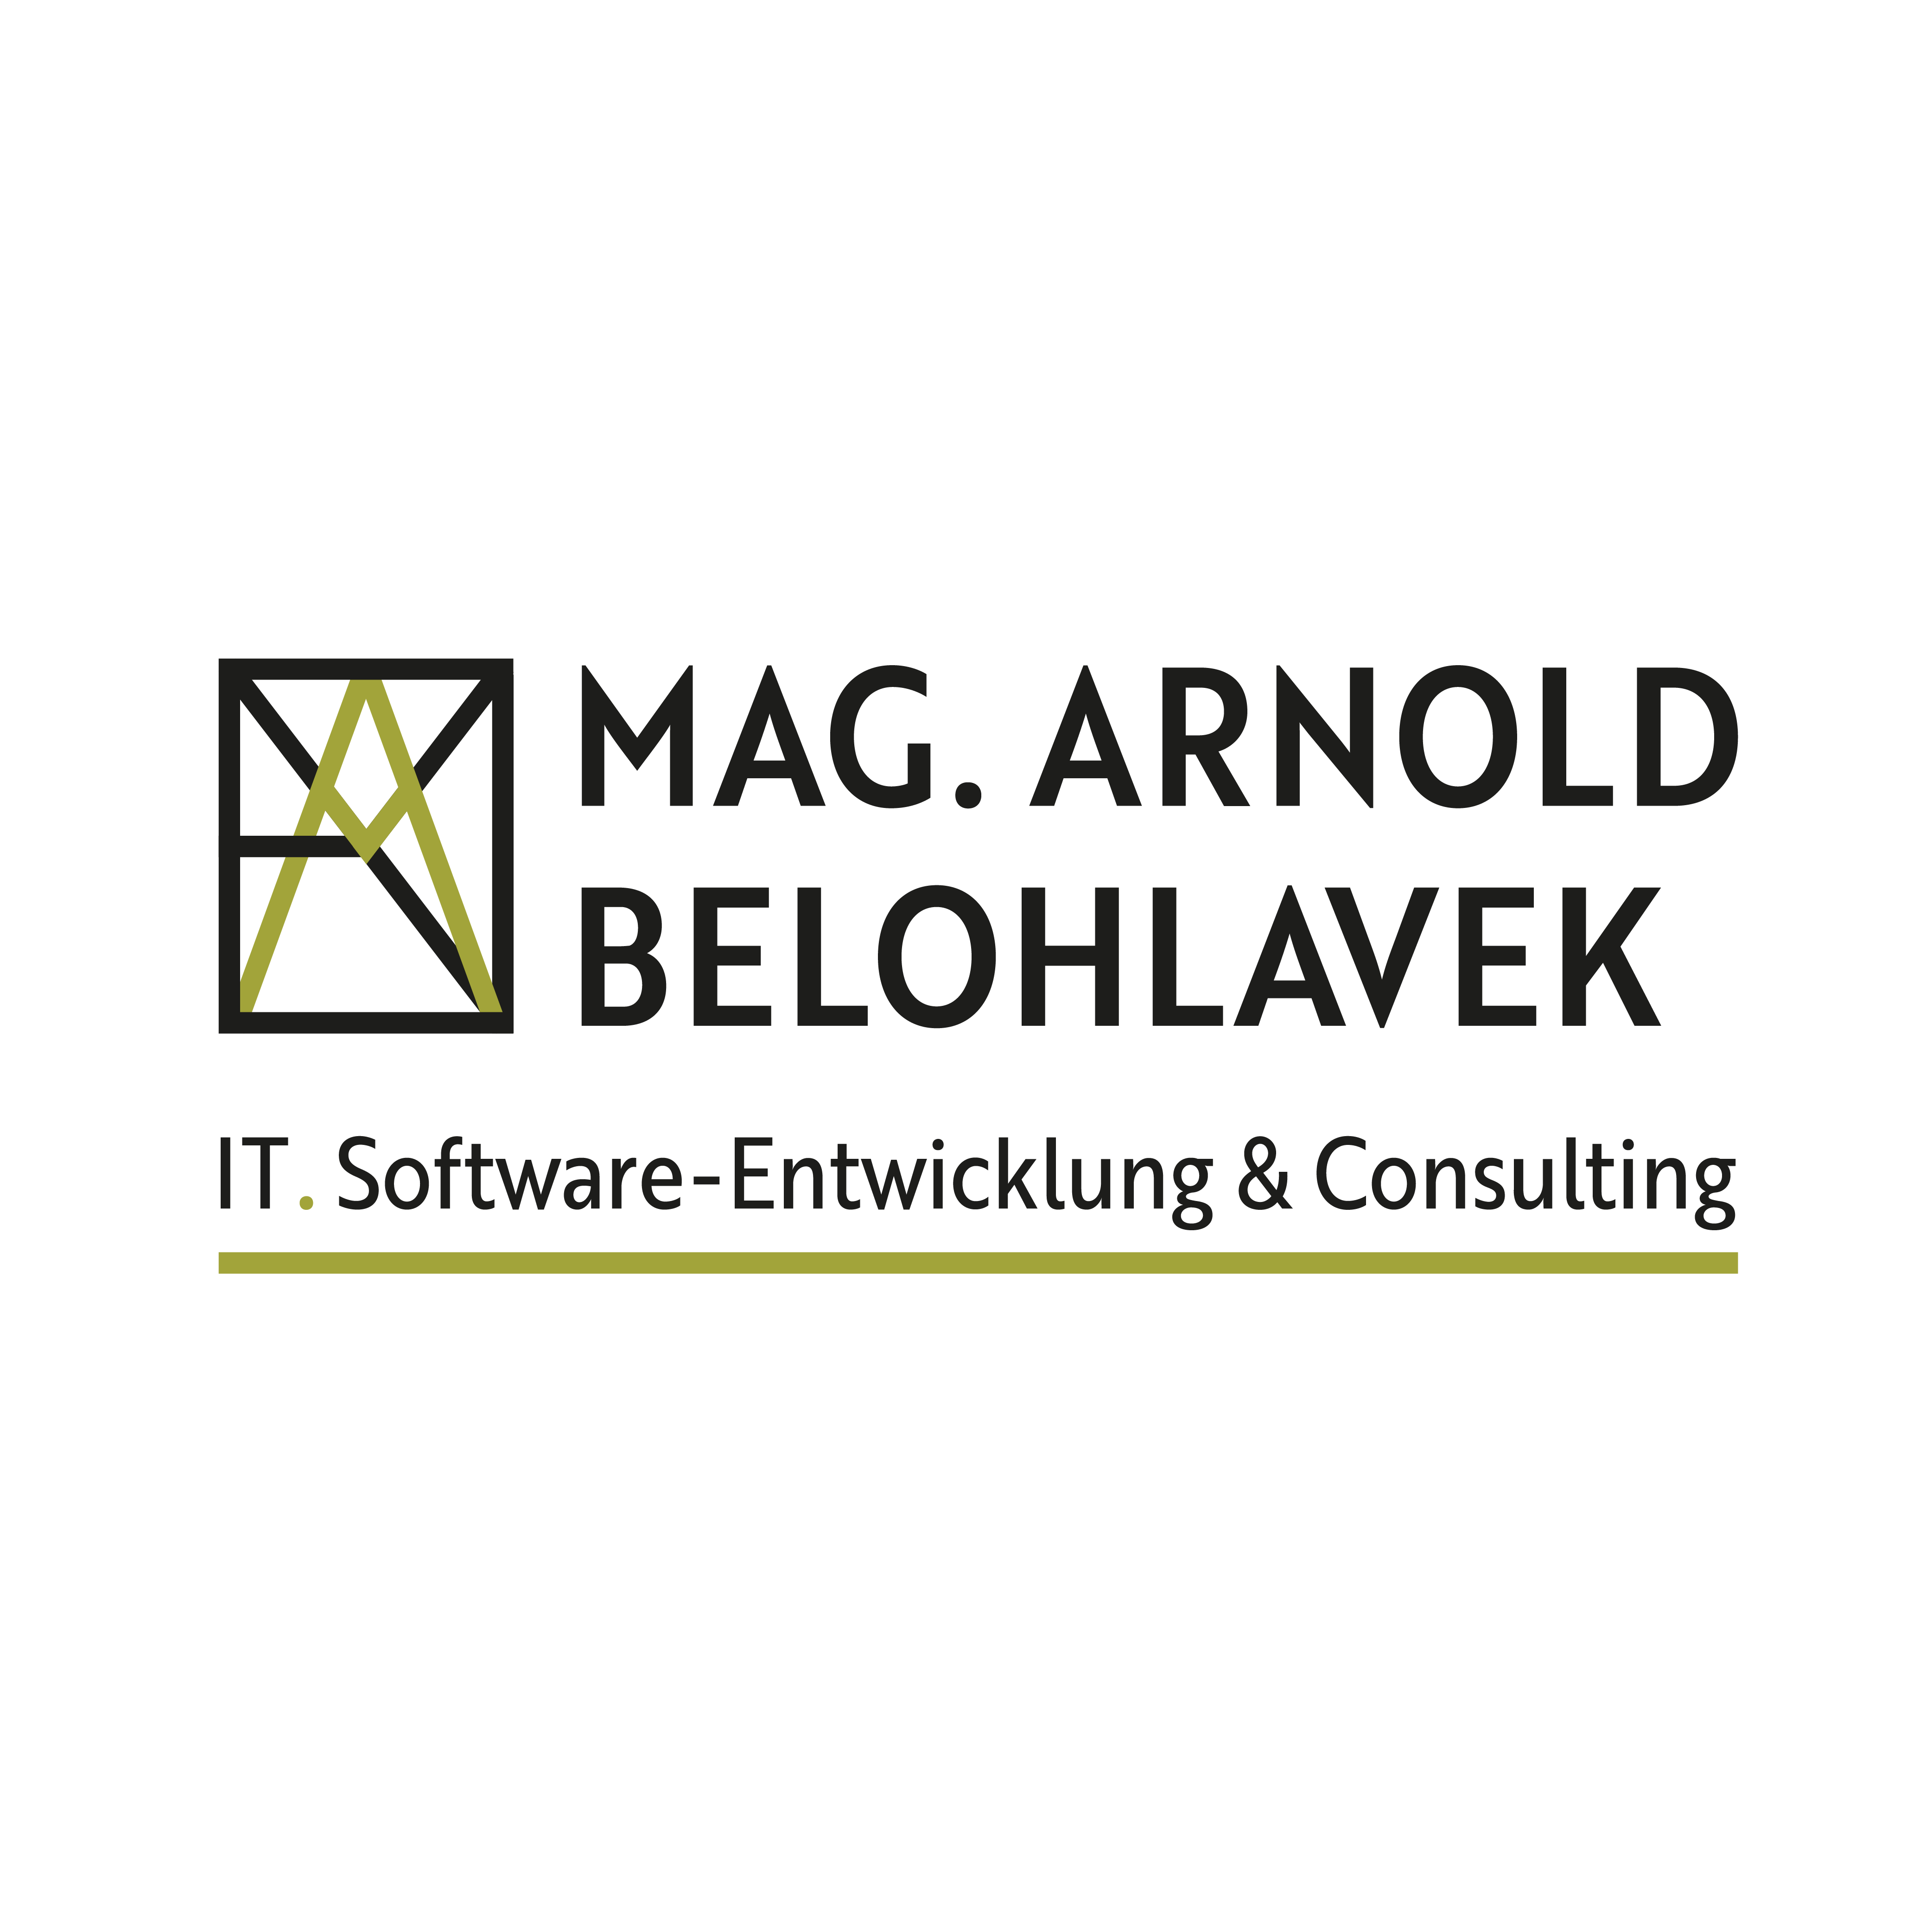 logo mag. arnold belohlavek. IT. software-entwicklung & consulting